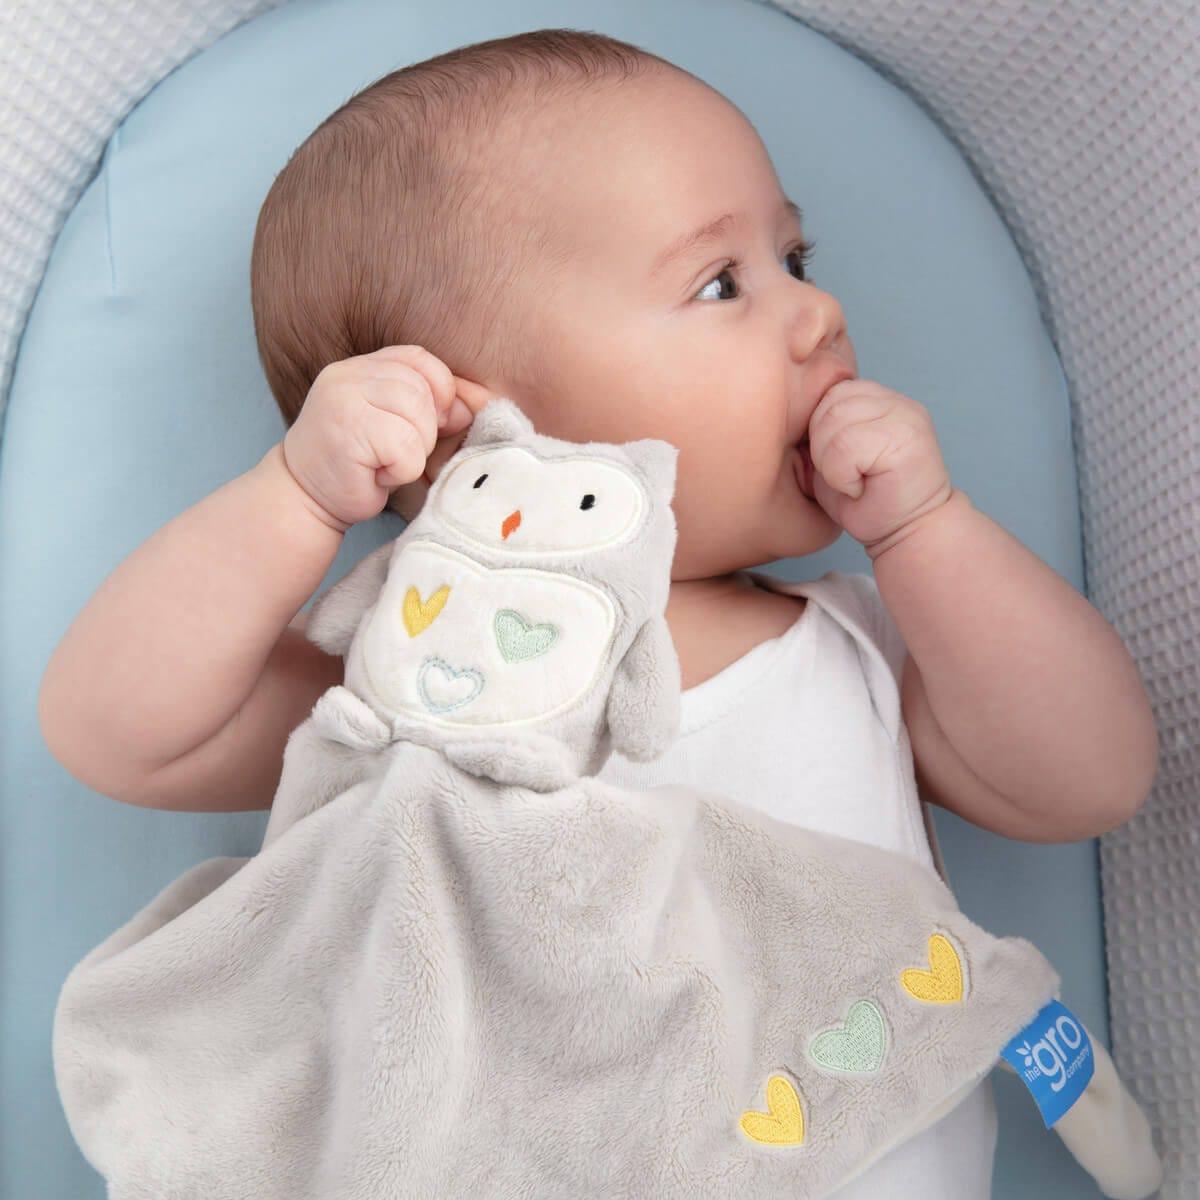 baby-in-sleepee-basket-holding-ollie-the-owl-grocomforter